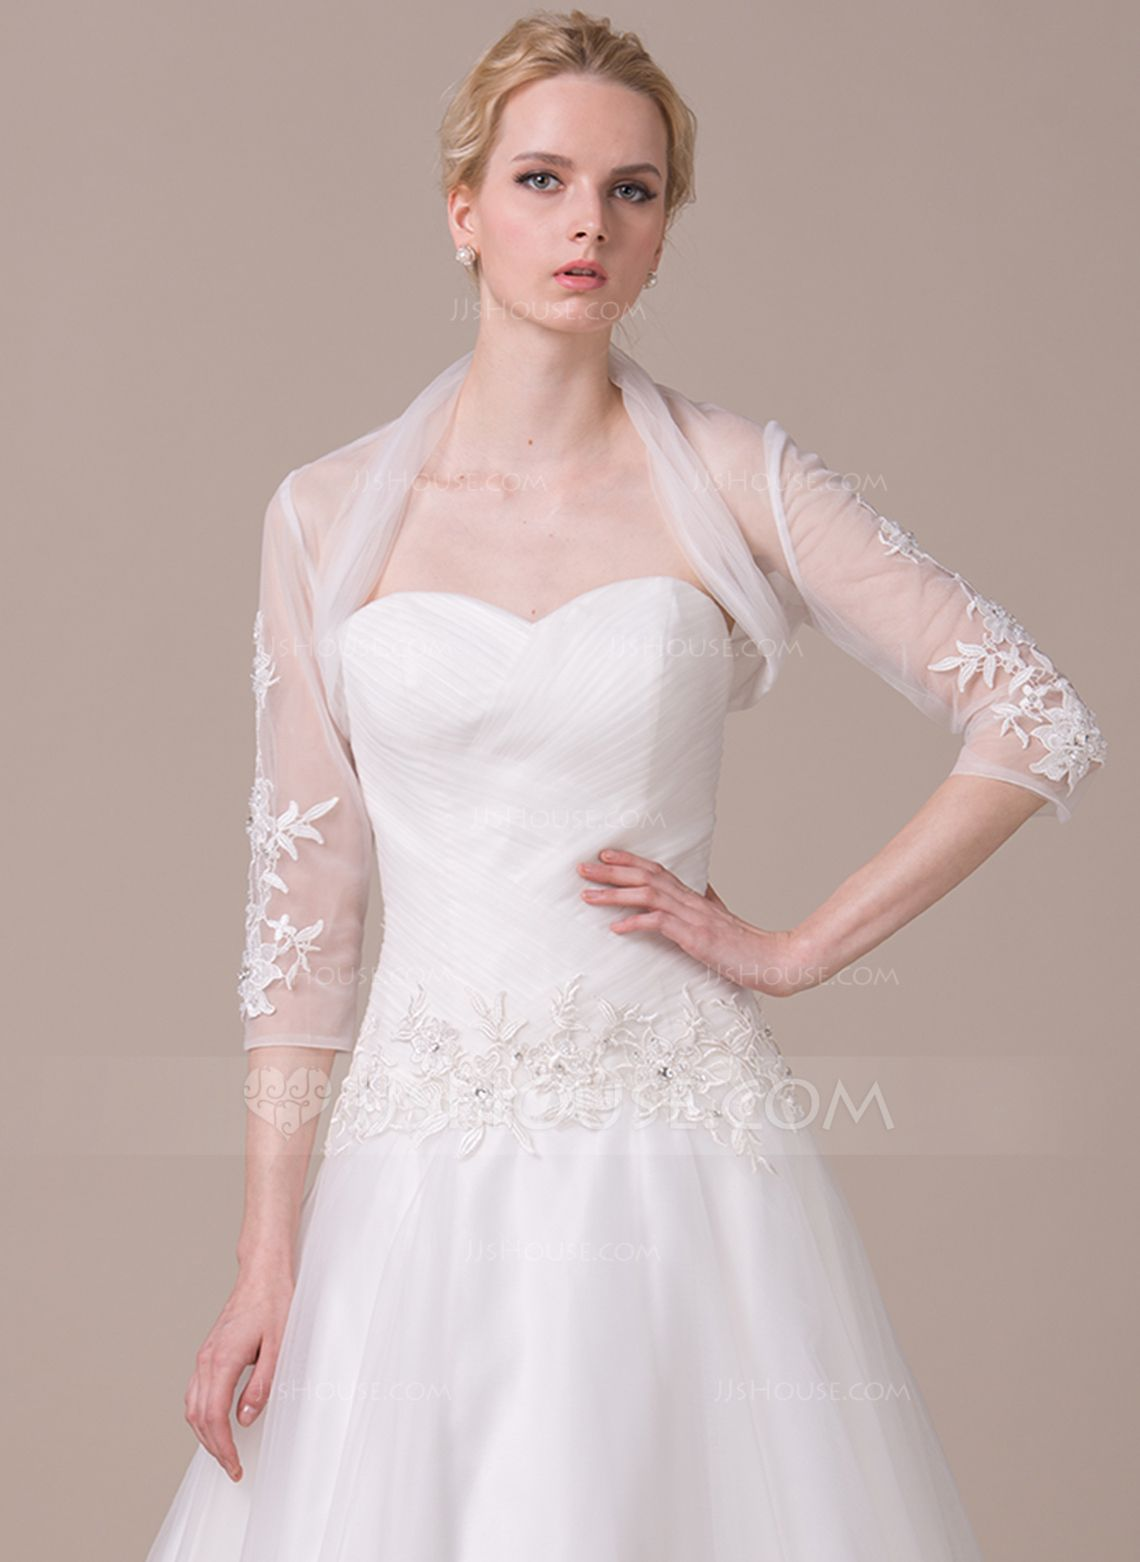 c6c66f515cfc 3/4-Length Sleeve Tulle Wedding Wrap (013063133) - JJsHouse ...